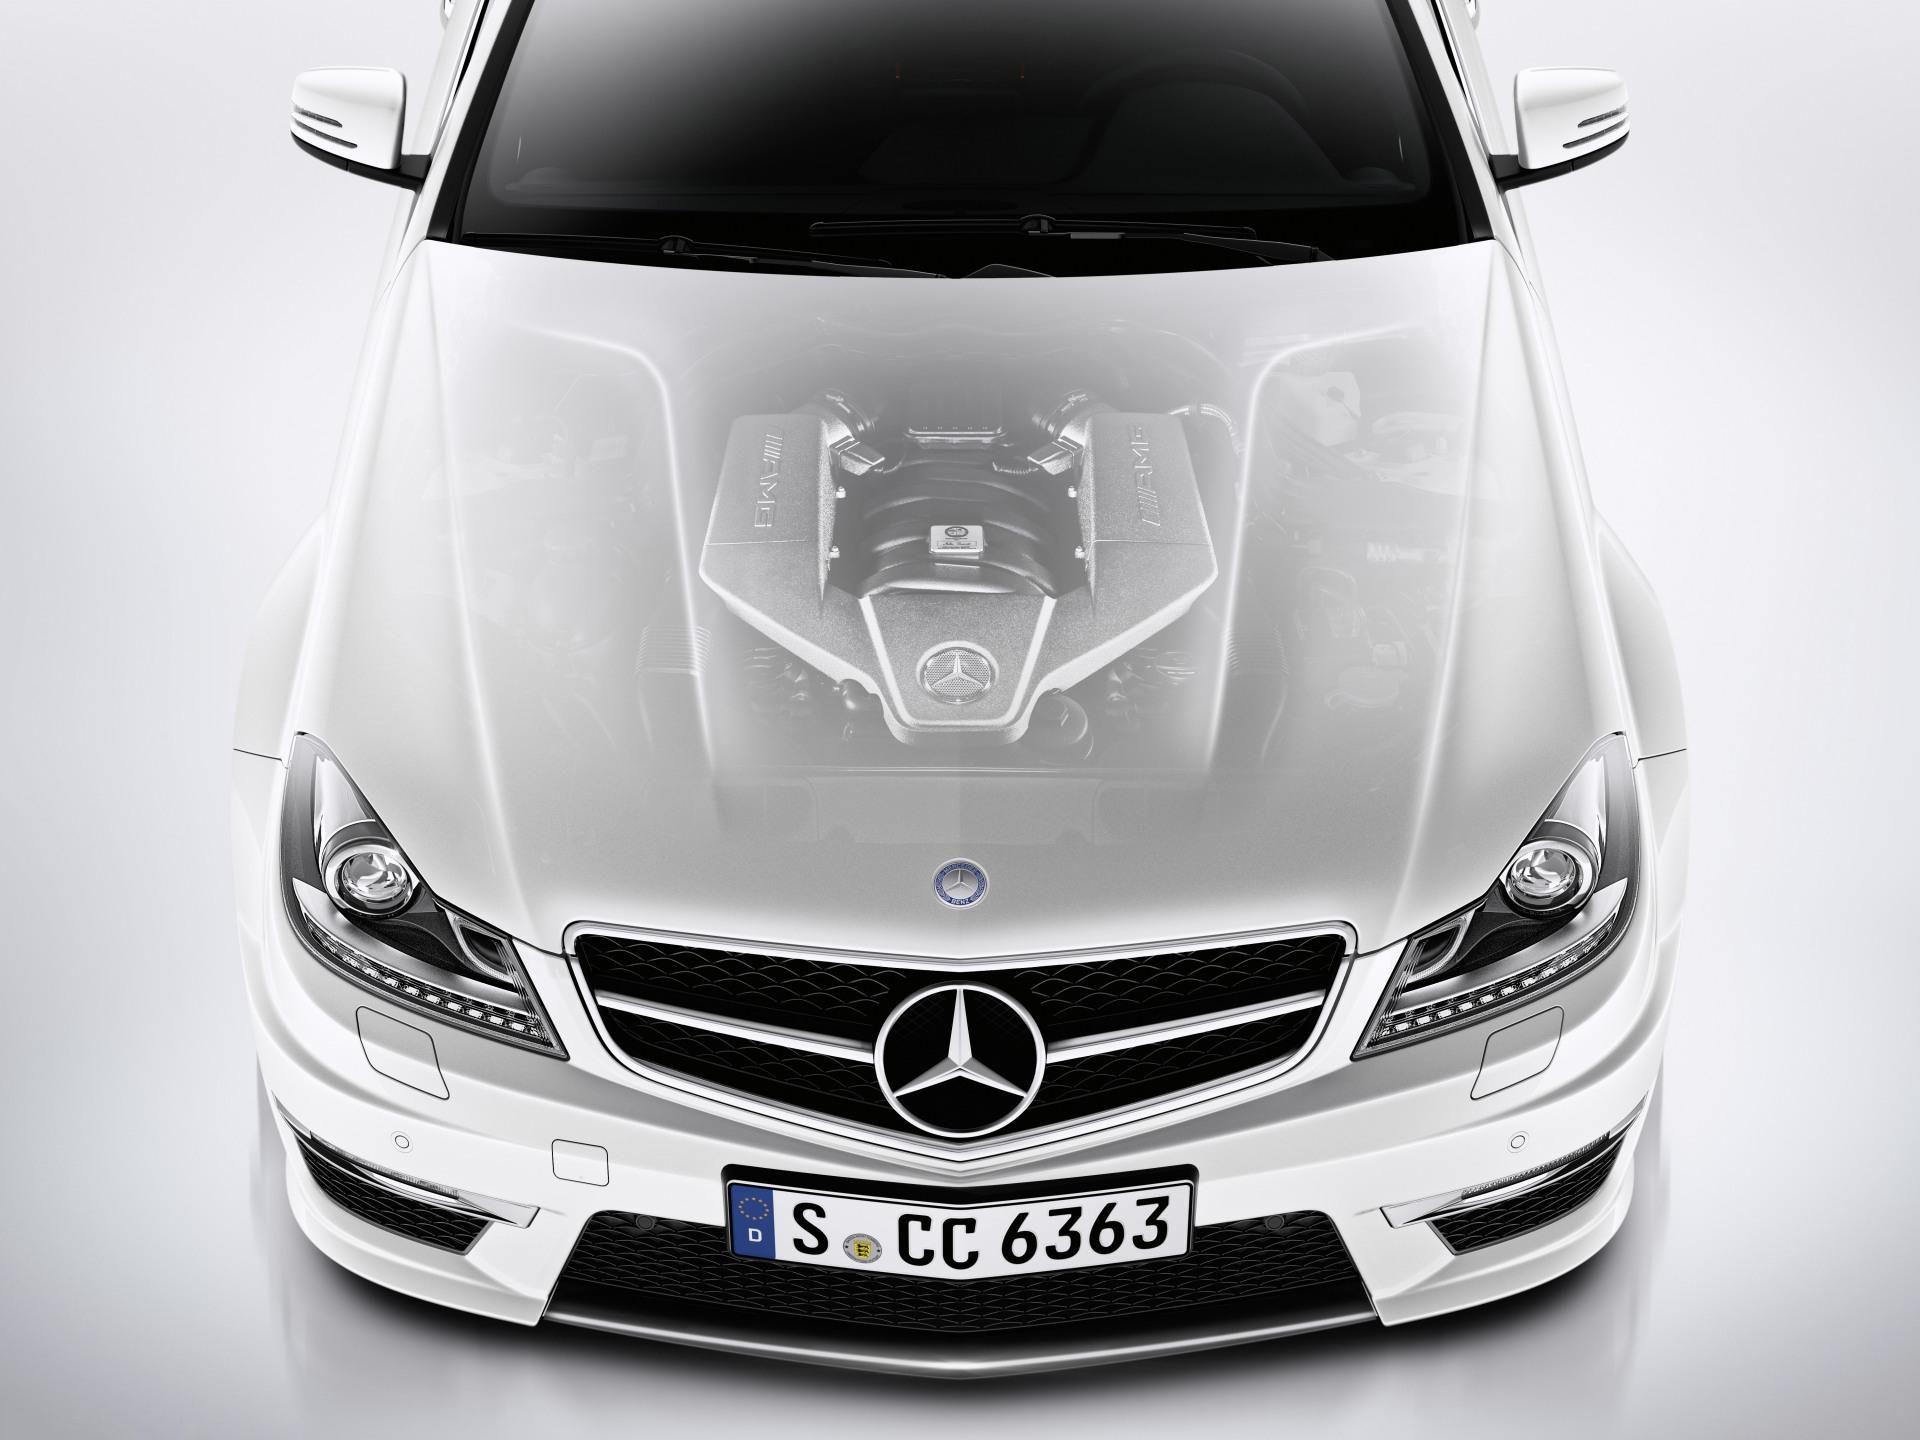 2014 Mercedes C Class Coupe Engine Mercedes C Class Coupe Mercedes Benz C63 Mercedes Benz C63 Amg